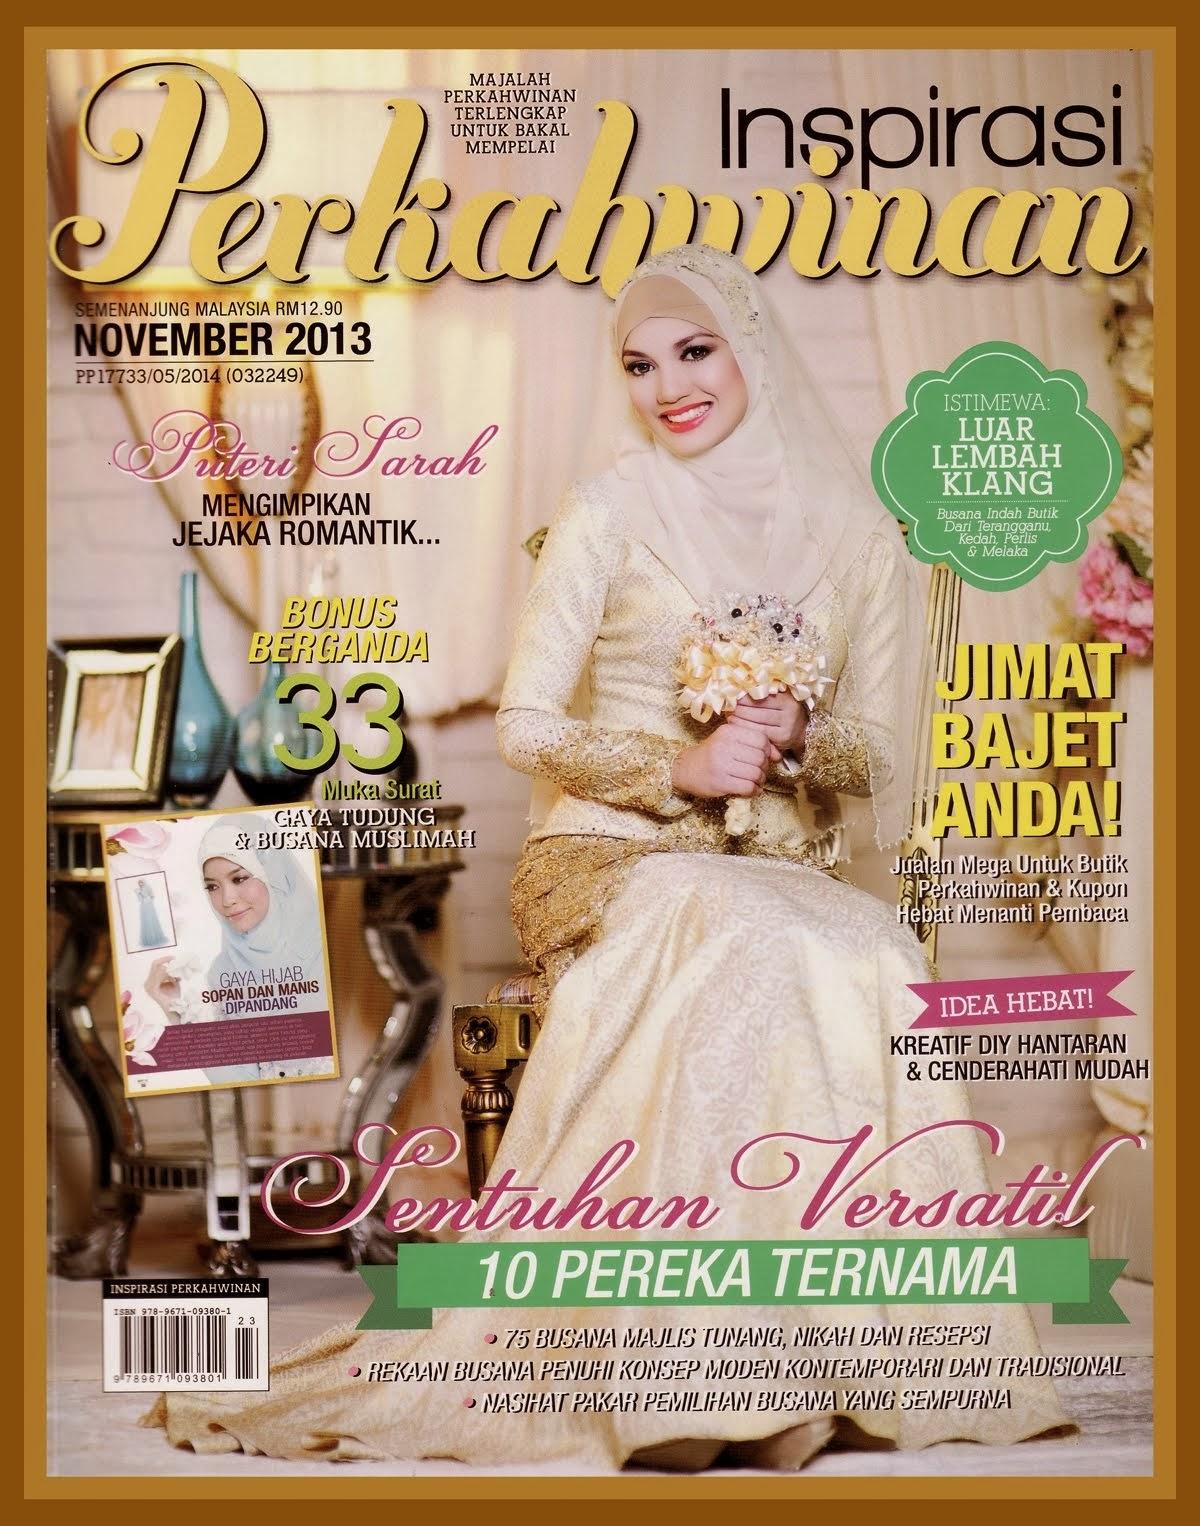 CANDY PARADISE DALAM  INSPIRASI PERKAHWINAN ISSUE NOVEMBER 2013